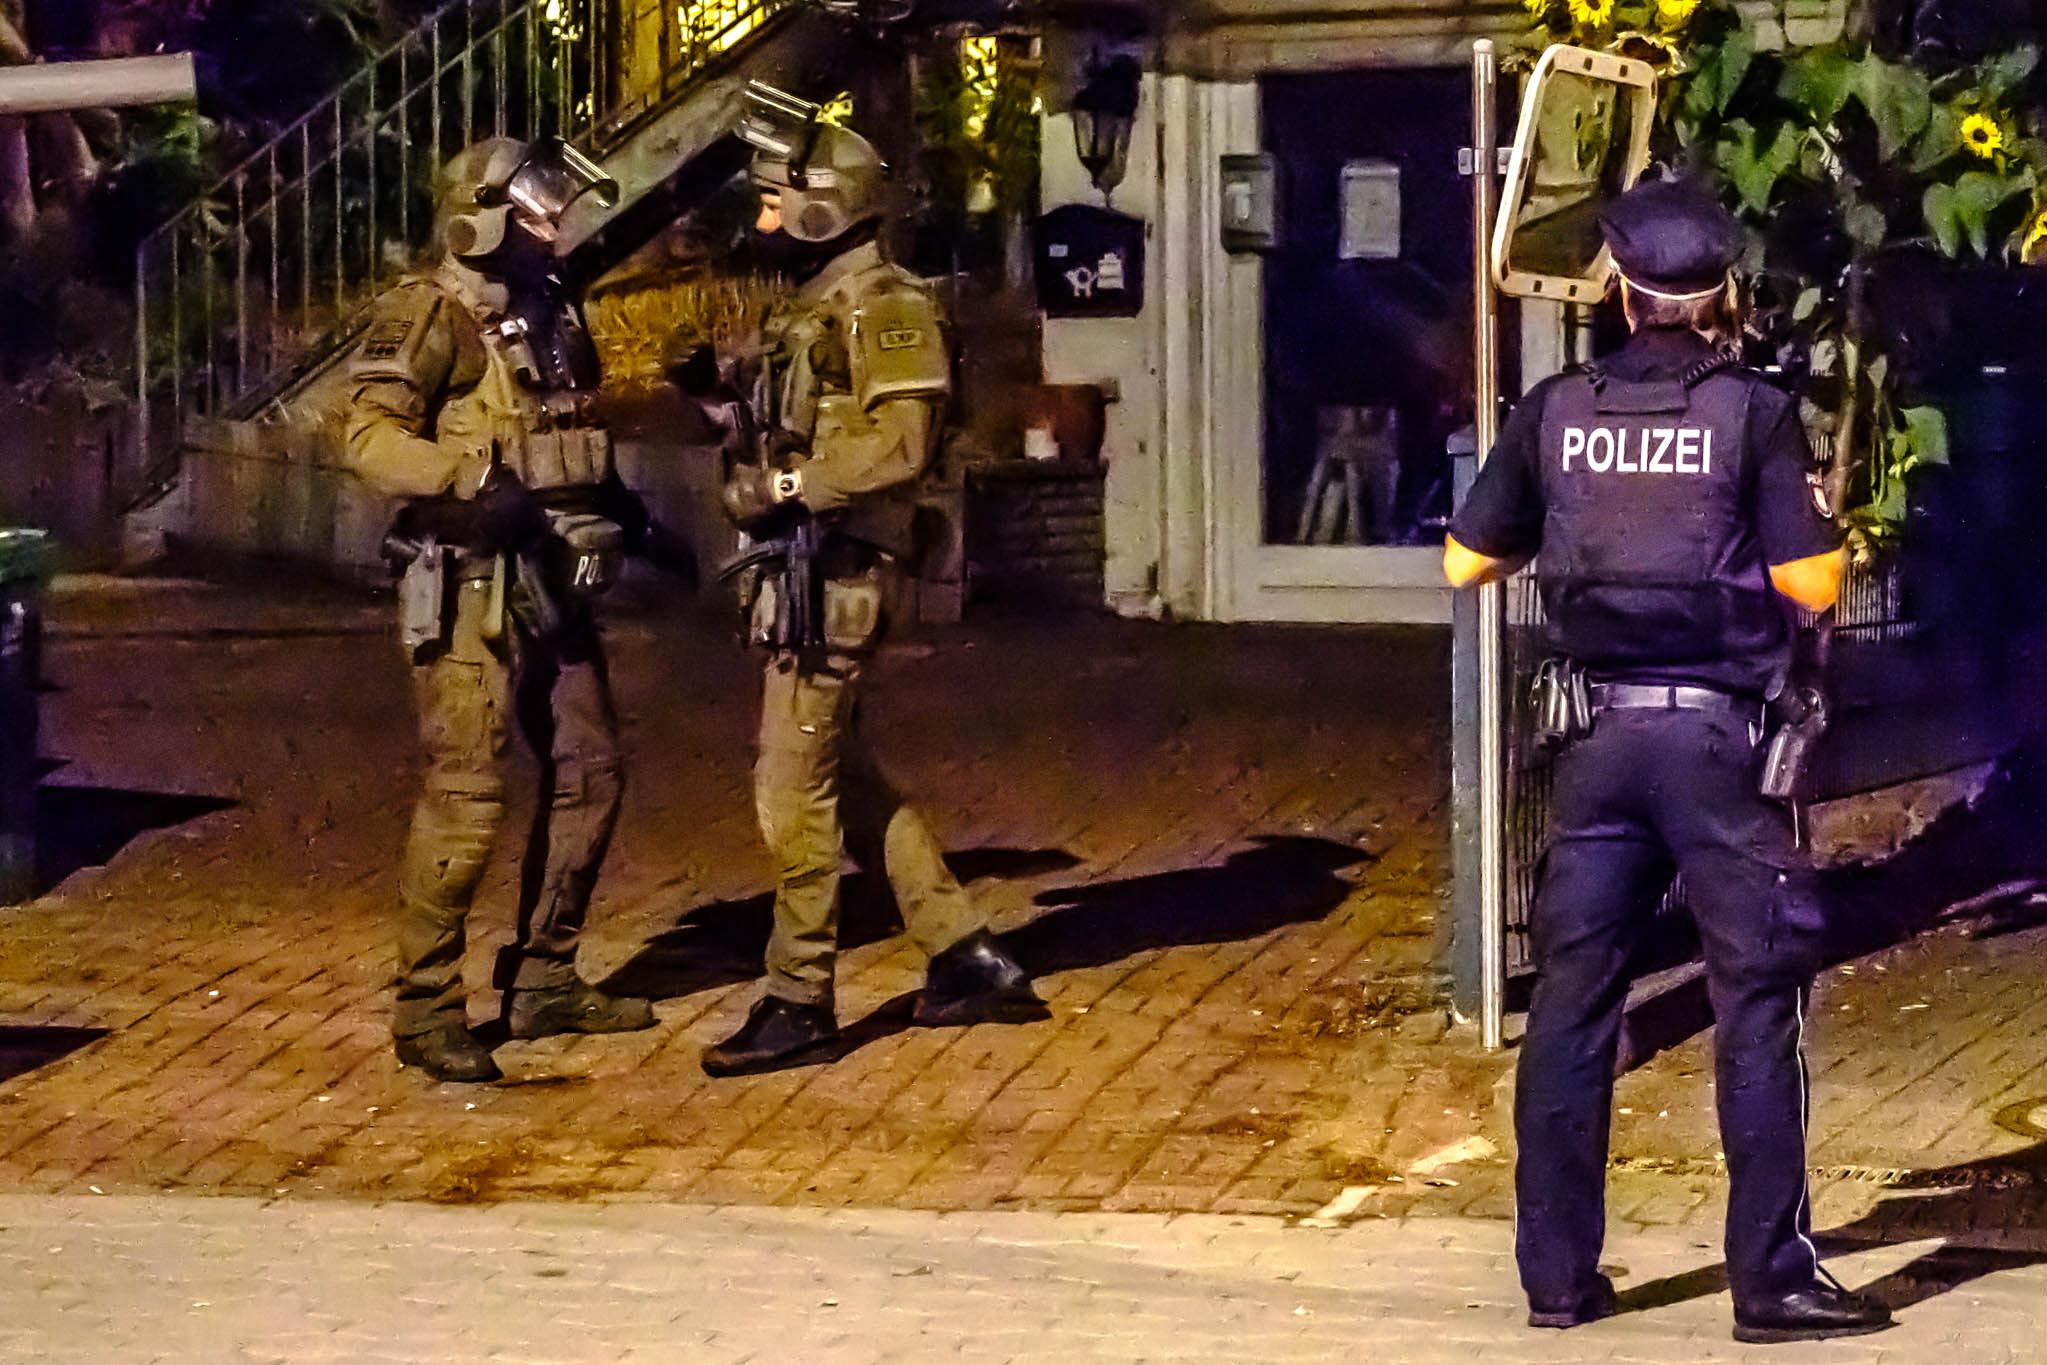 Michael Arning - 2018-10-13 Waffennarr aus Rahlstedt randaliert in WG